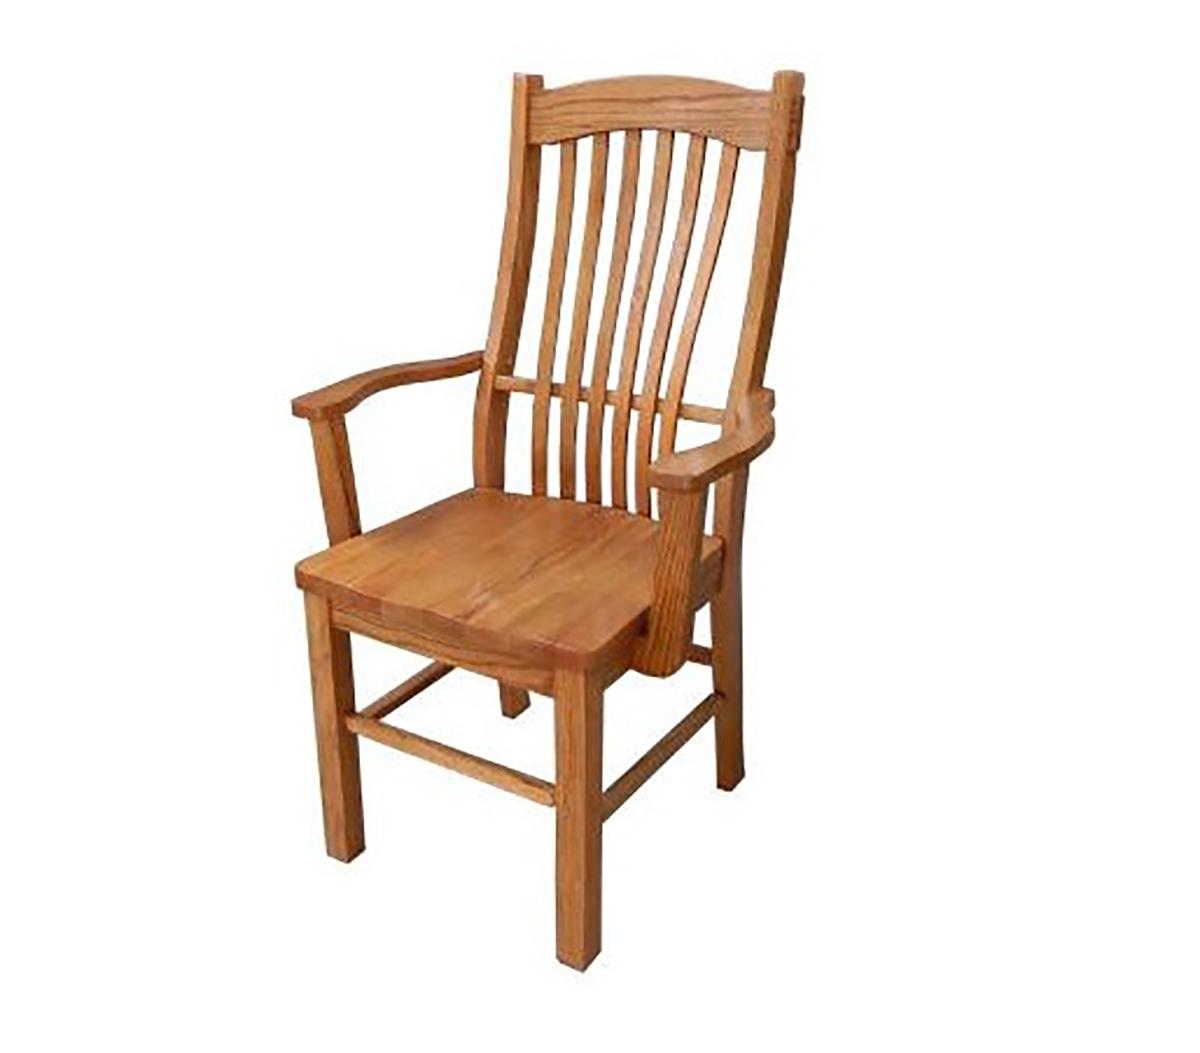 Chelsea Home Backwood Arm Chair - Hervest Oak